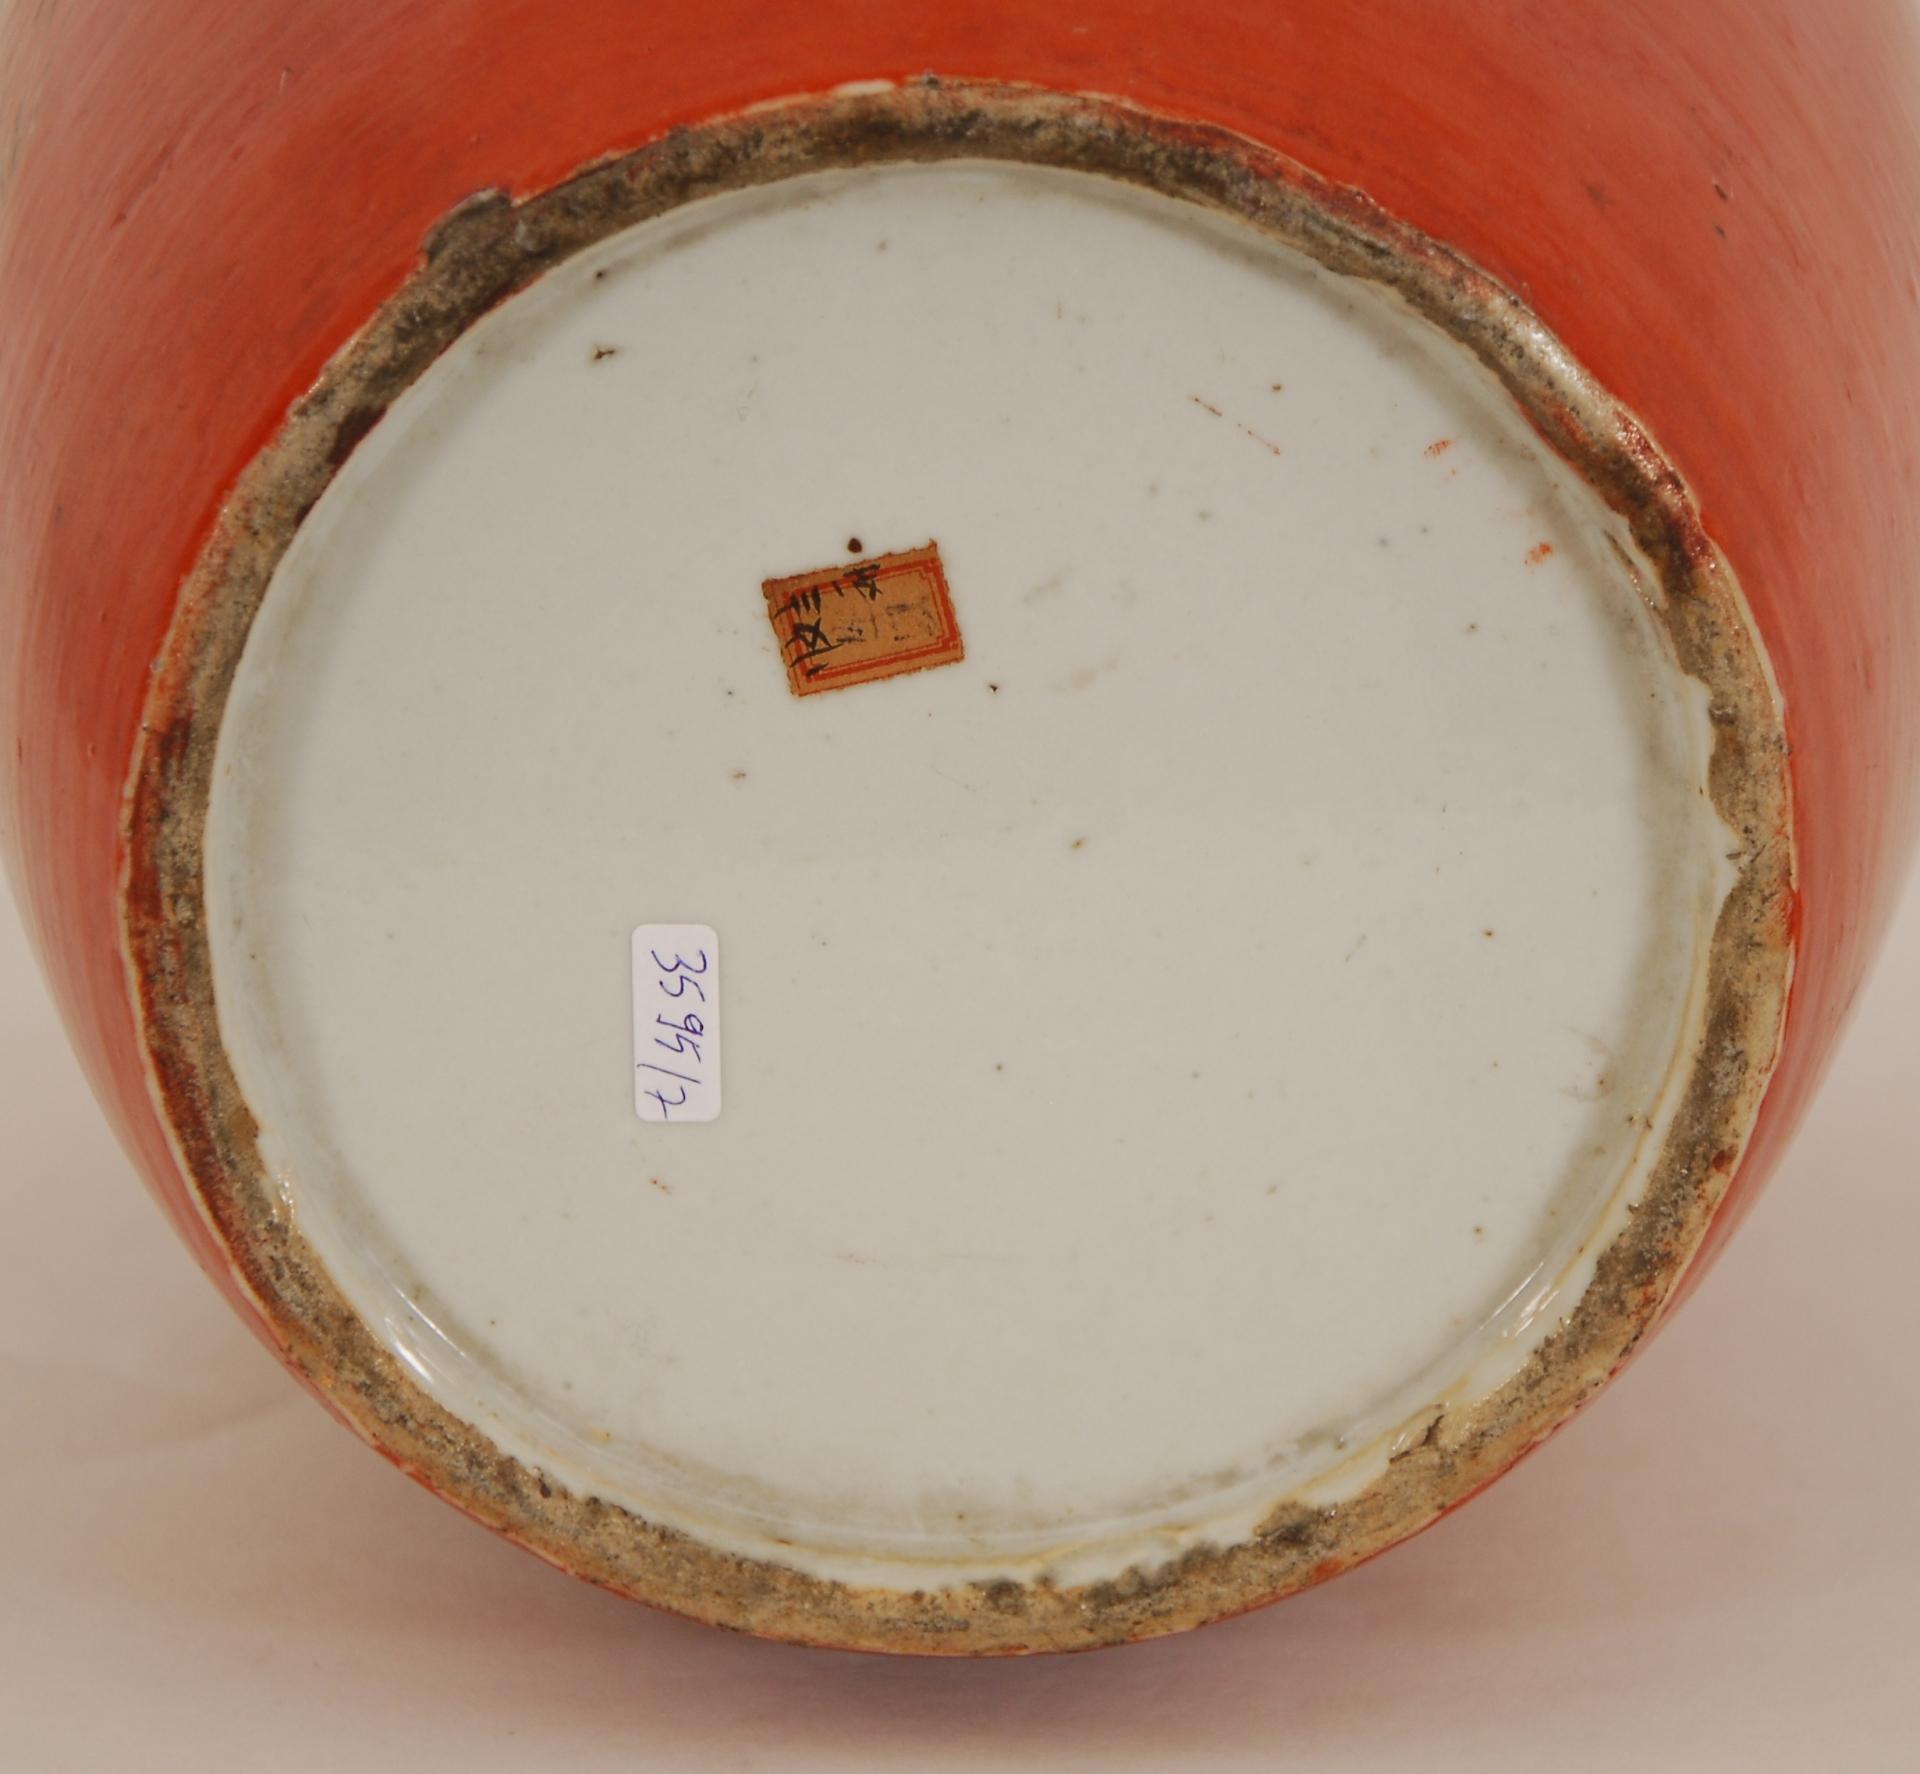 Vase ovoïde couvert